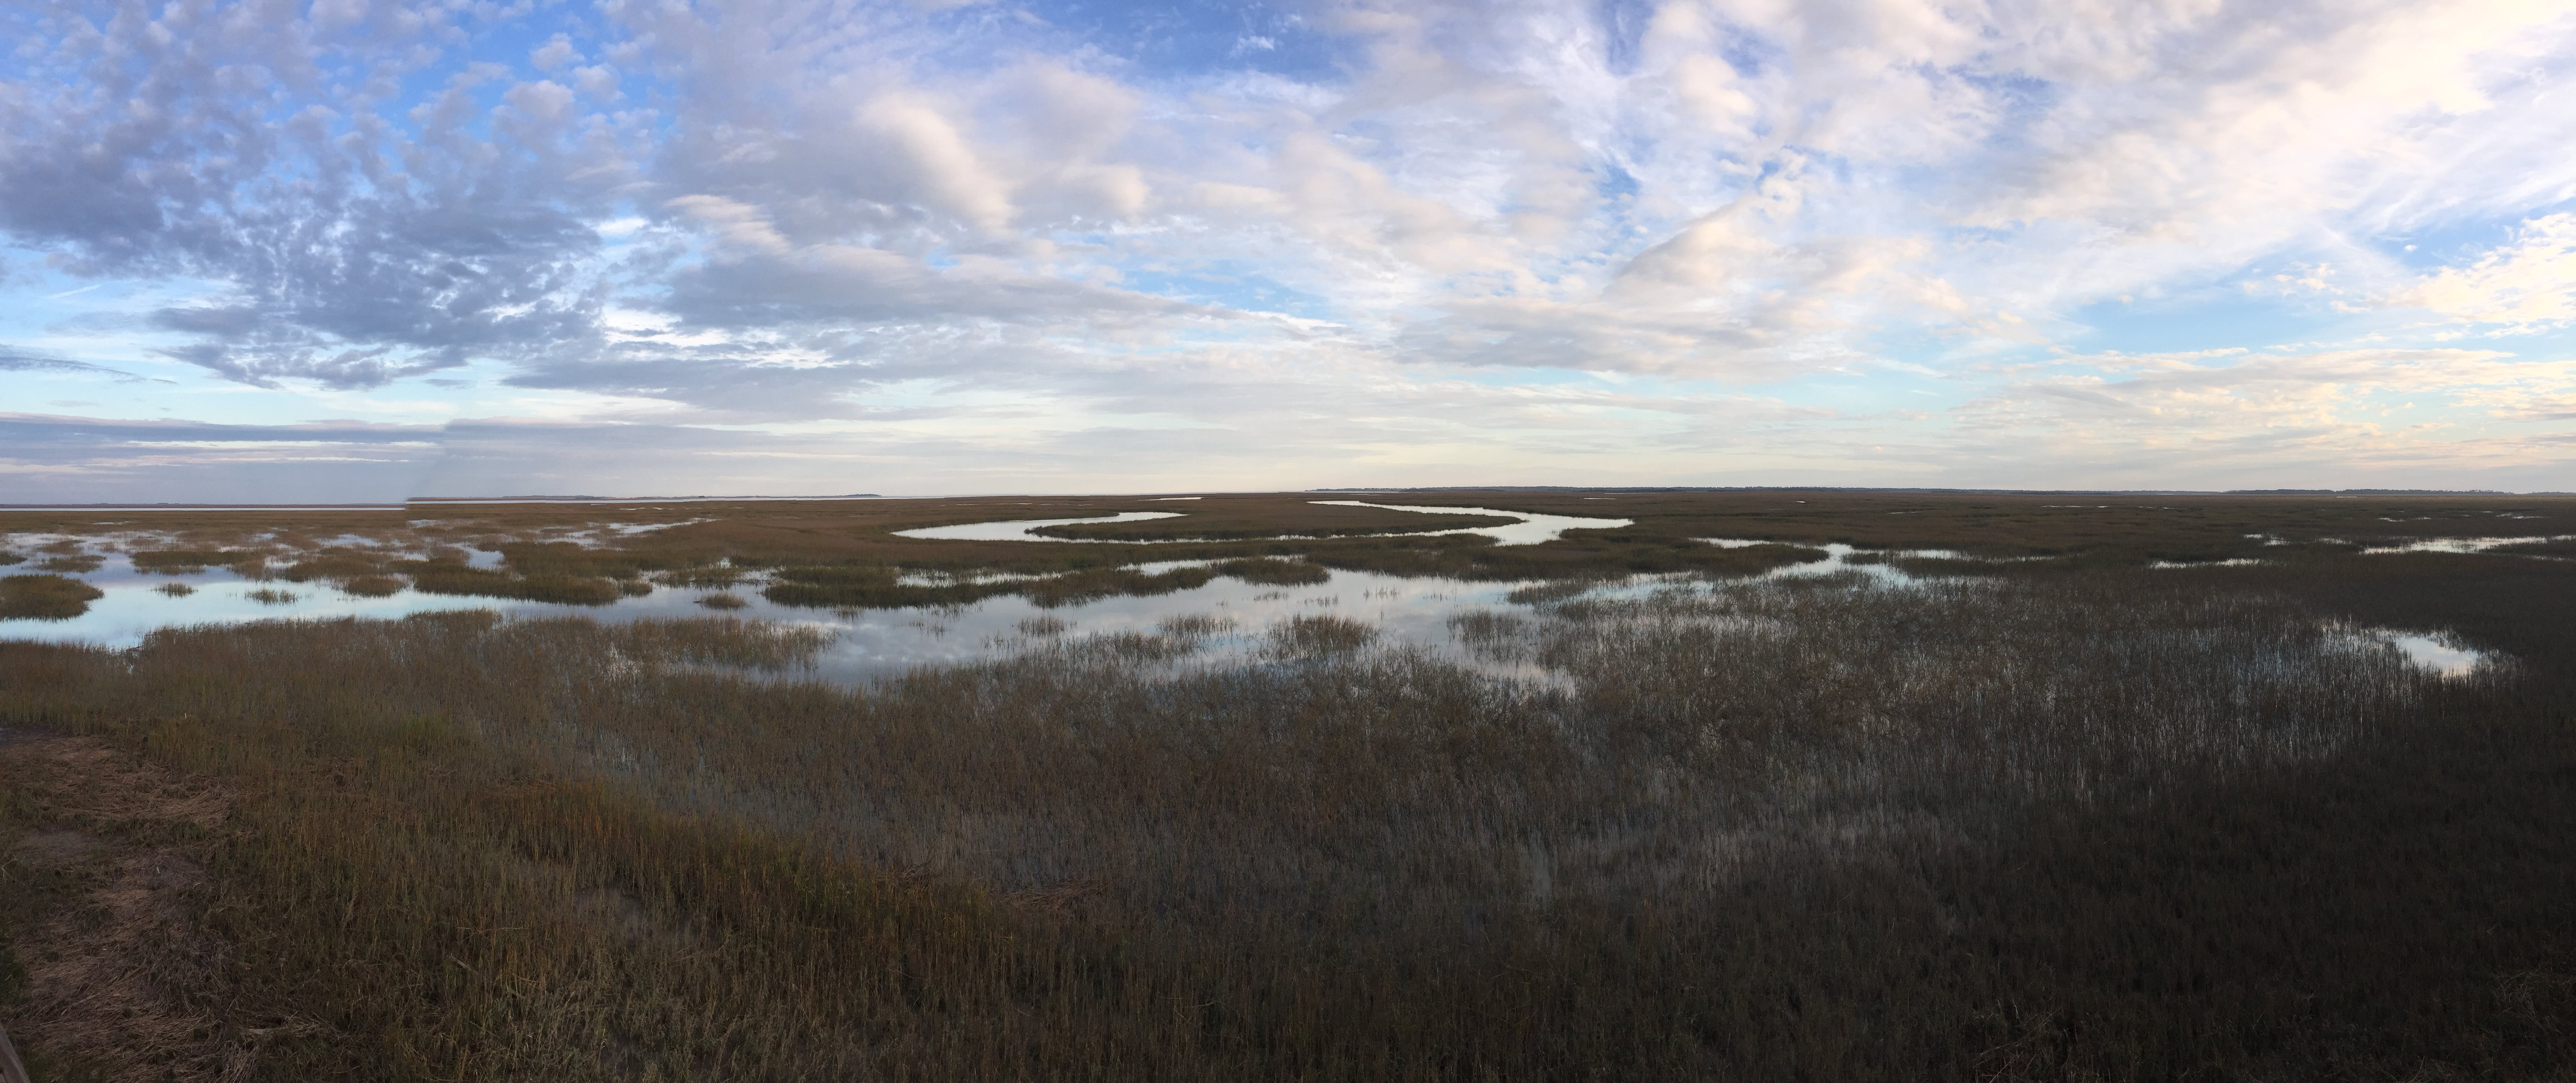 Panoramic Photo Of River